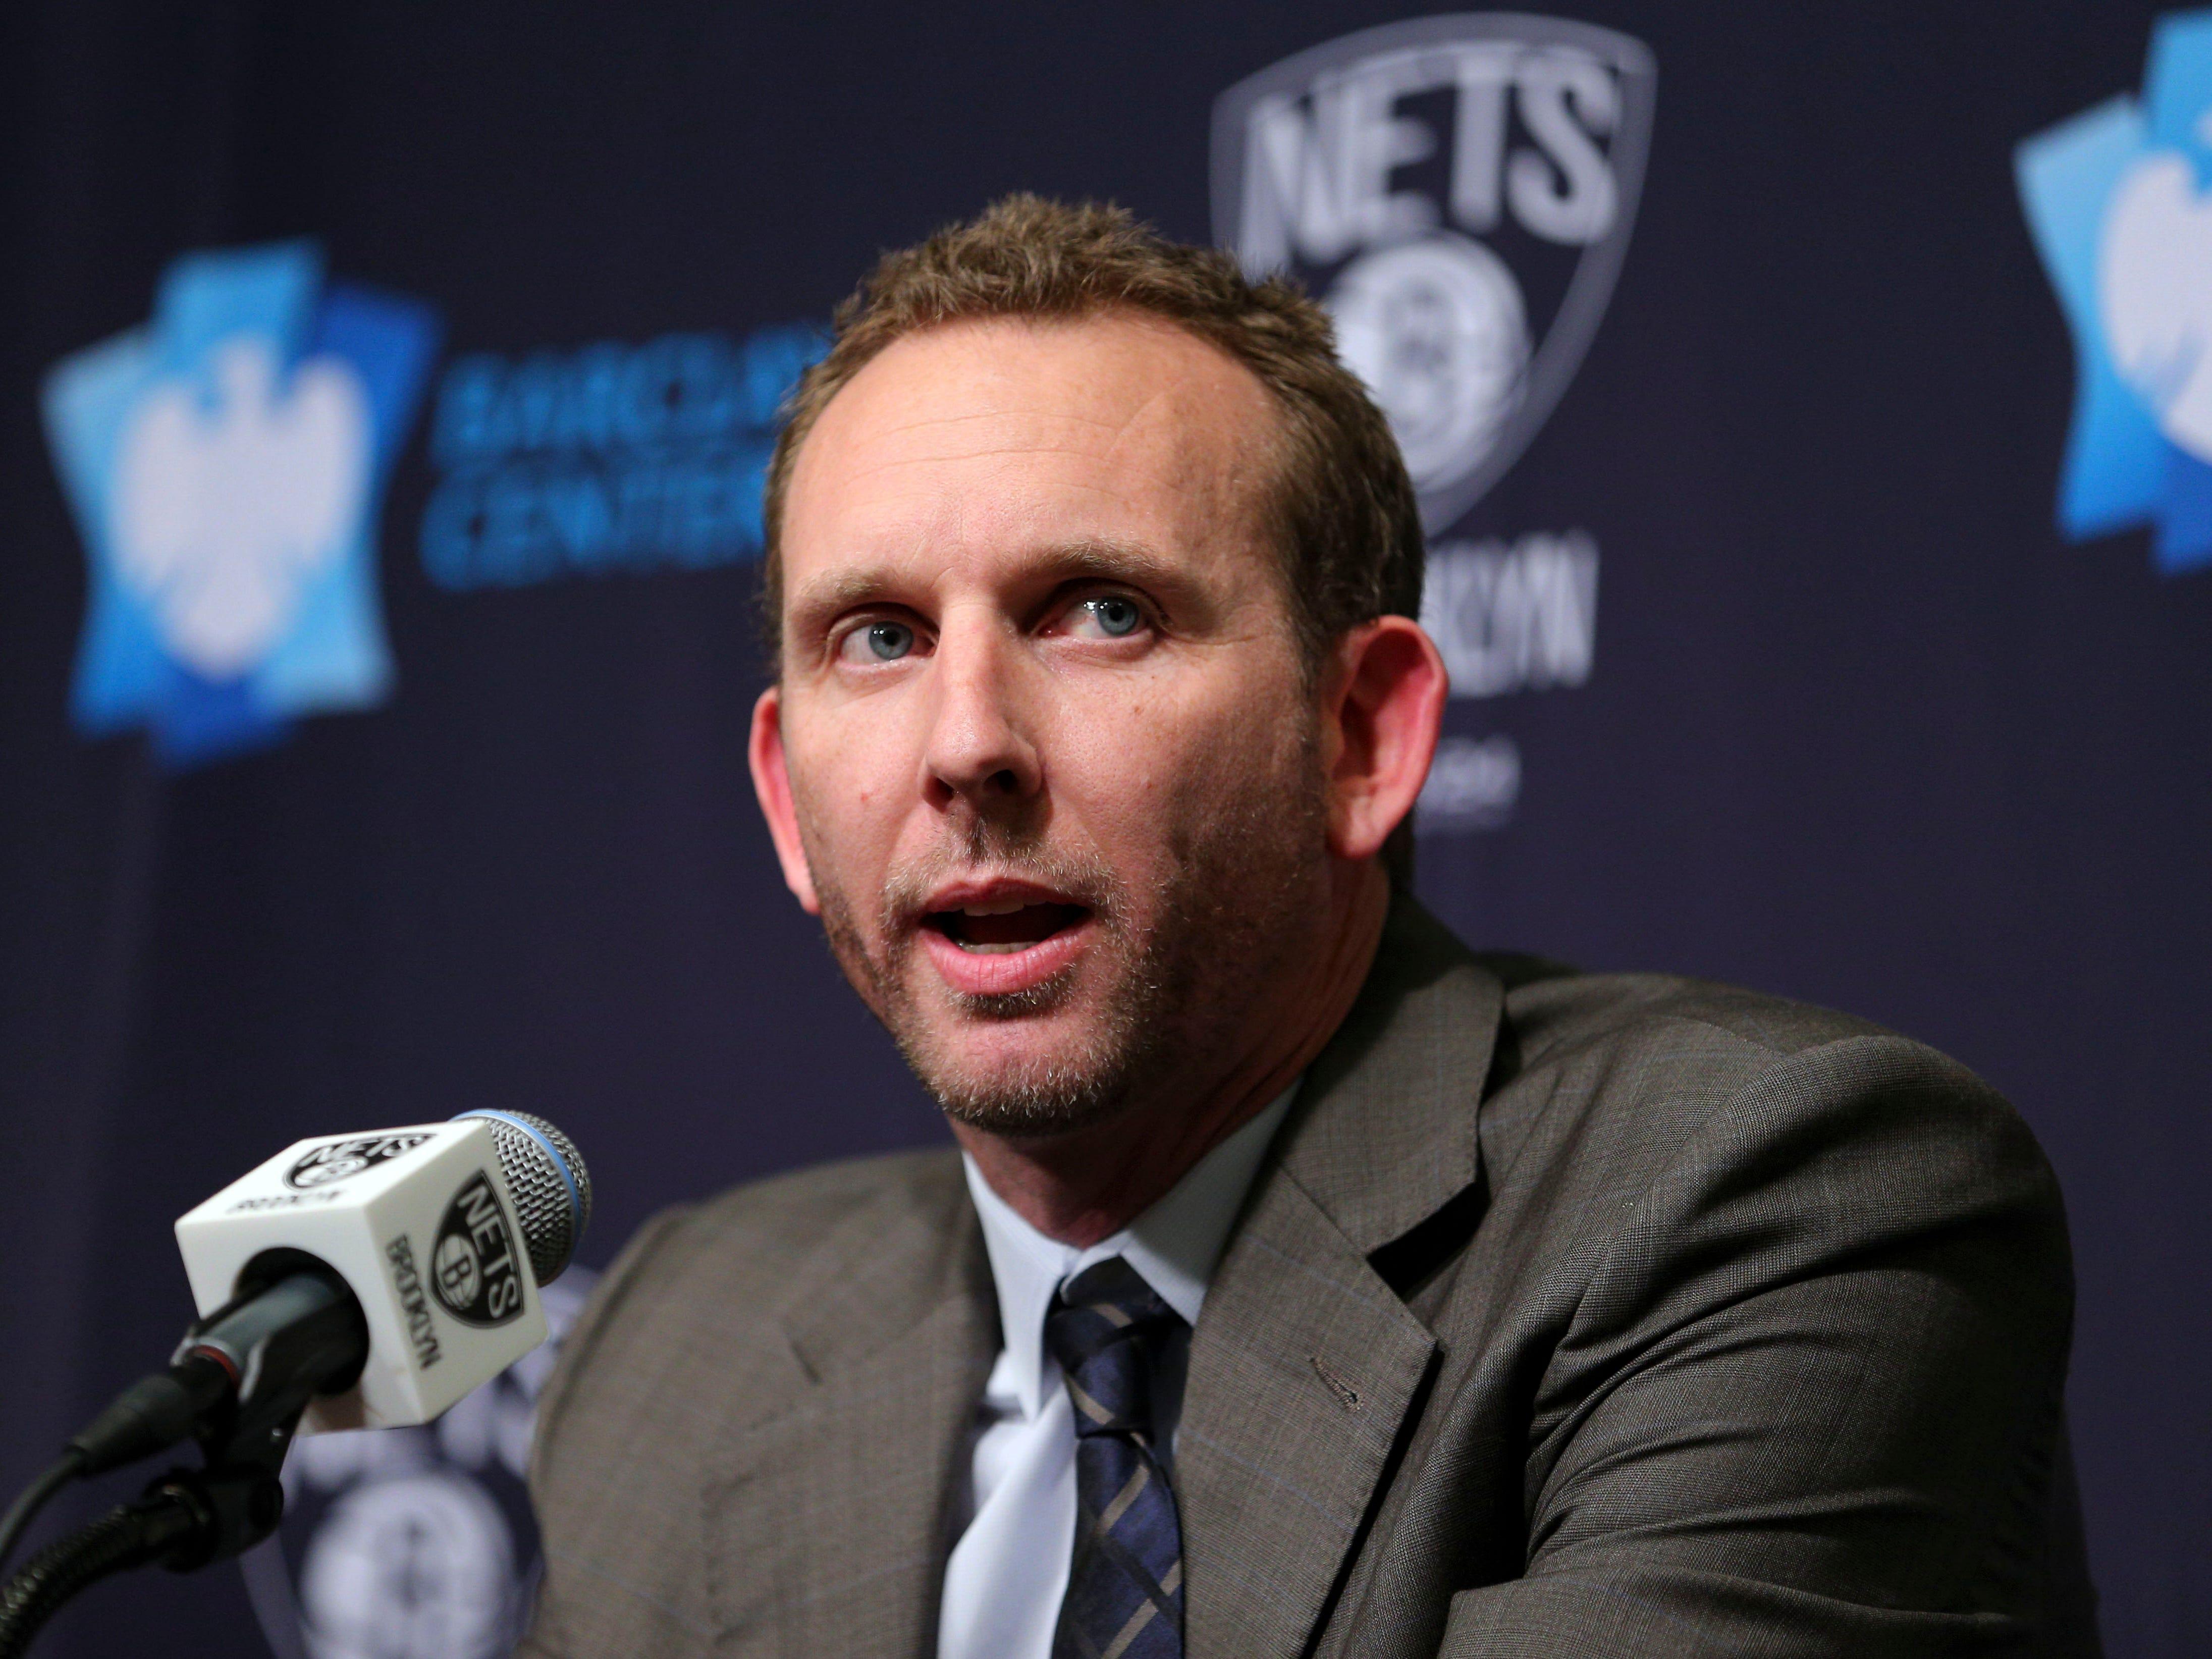 Nets GM Sean Marks fined, suspended for entering refs' locker room